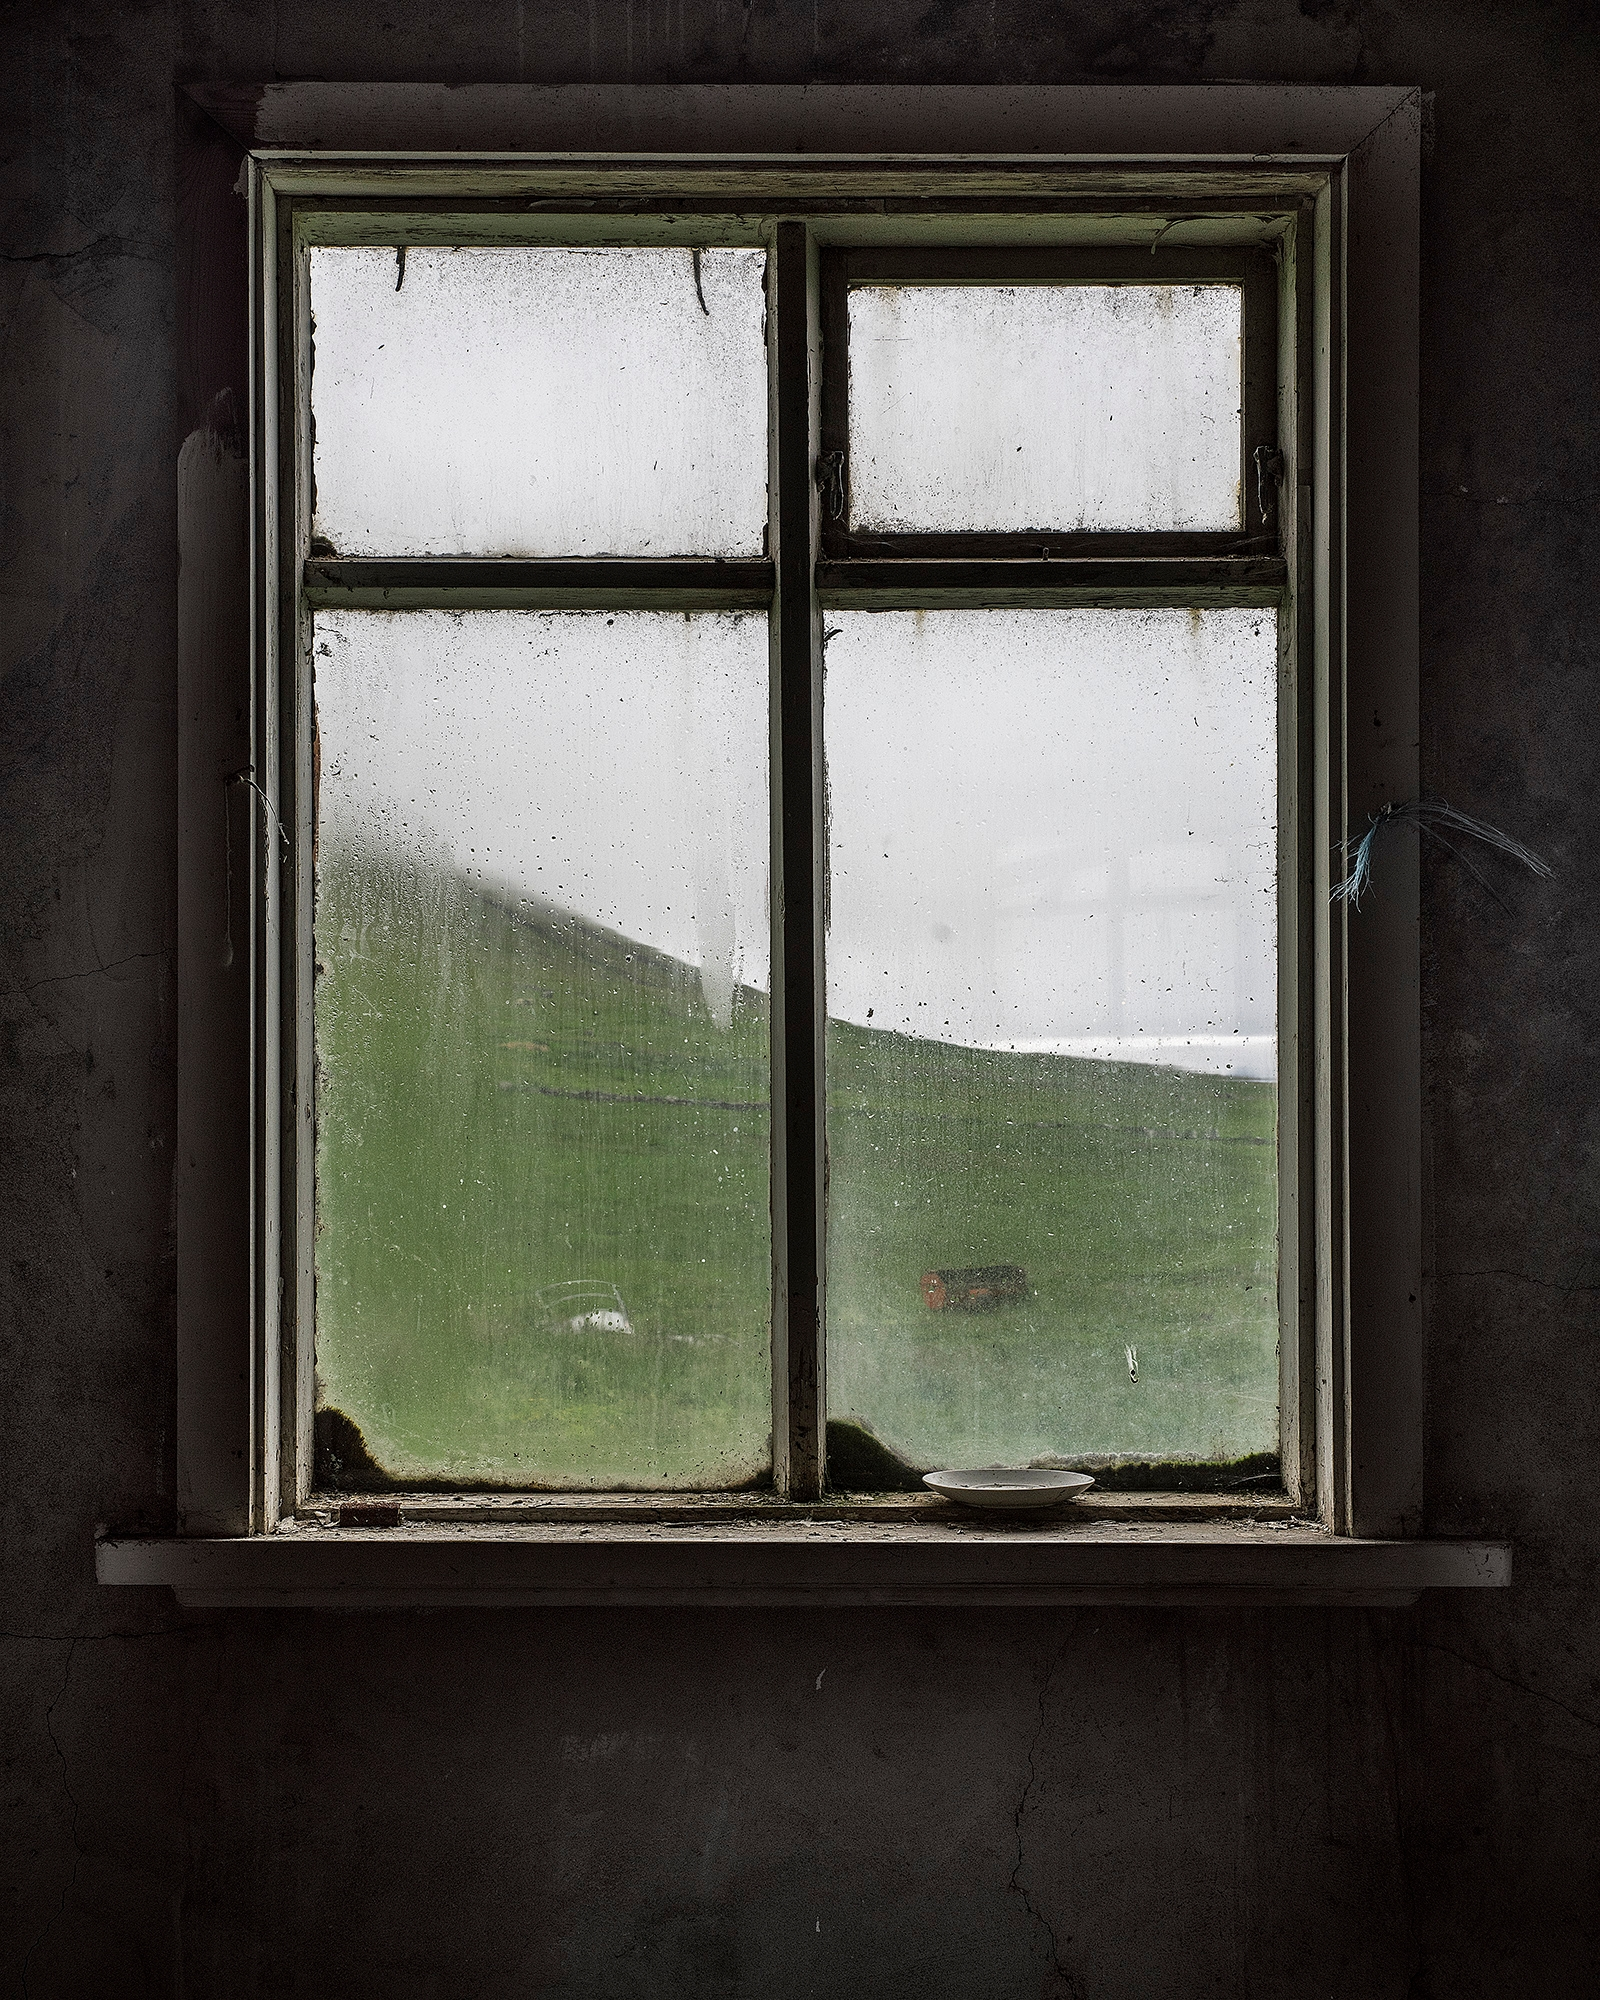 view, windows. view westward fa - forgottenheritage | ello